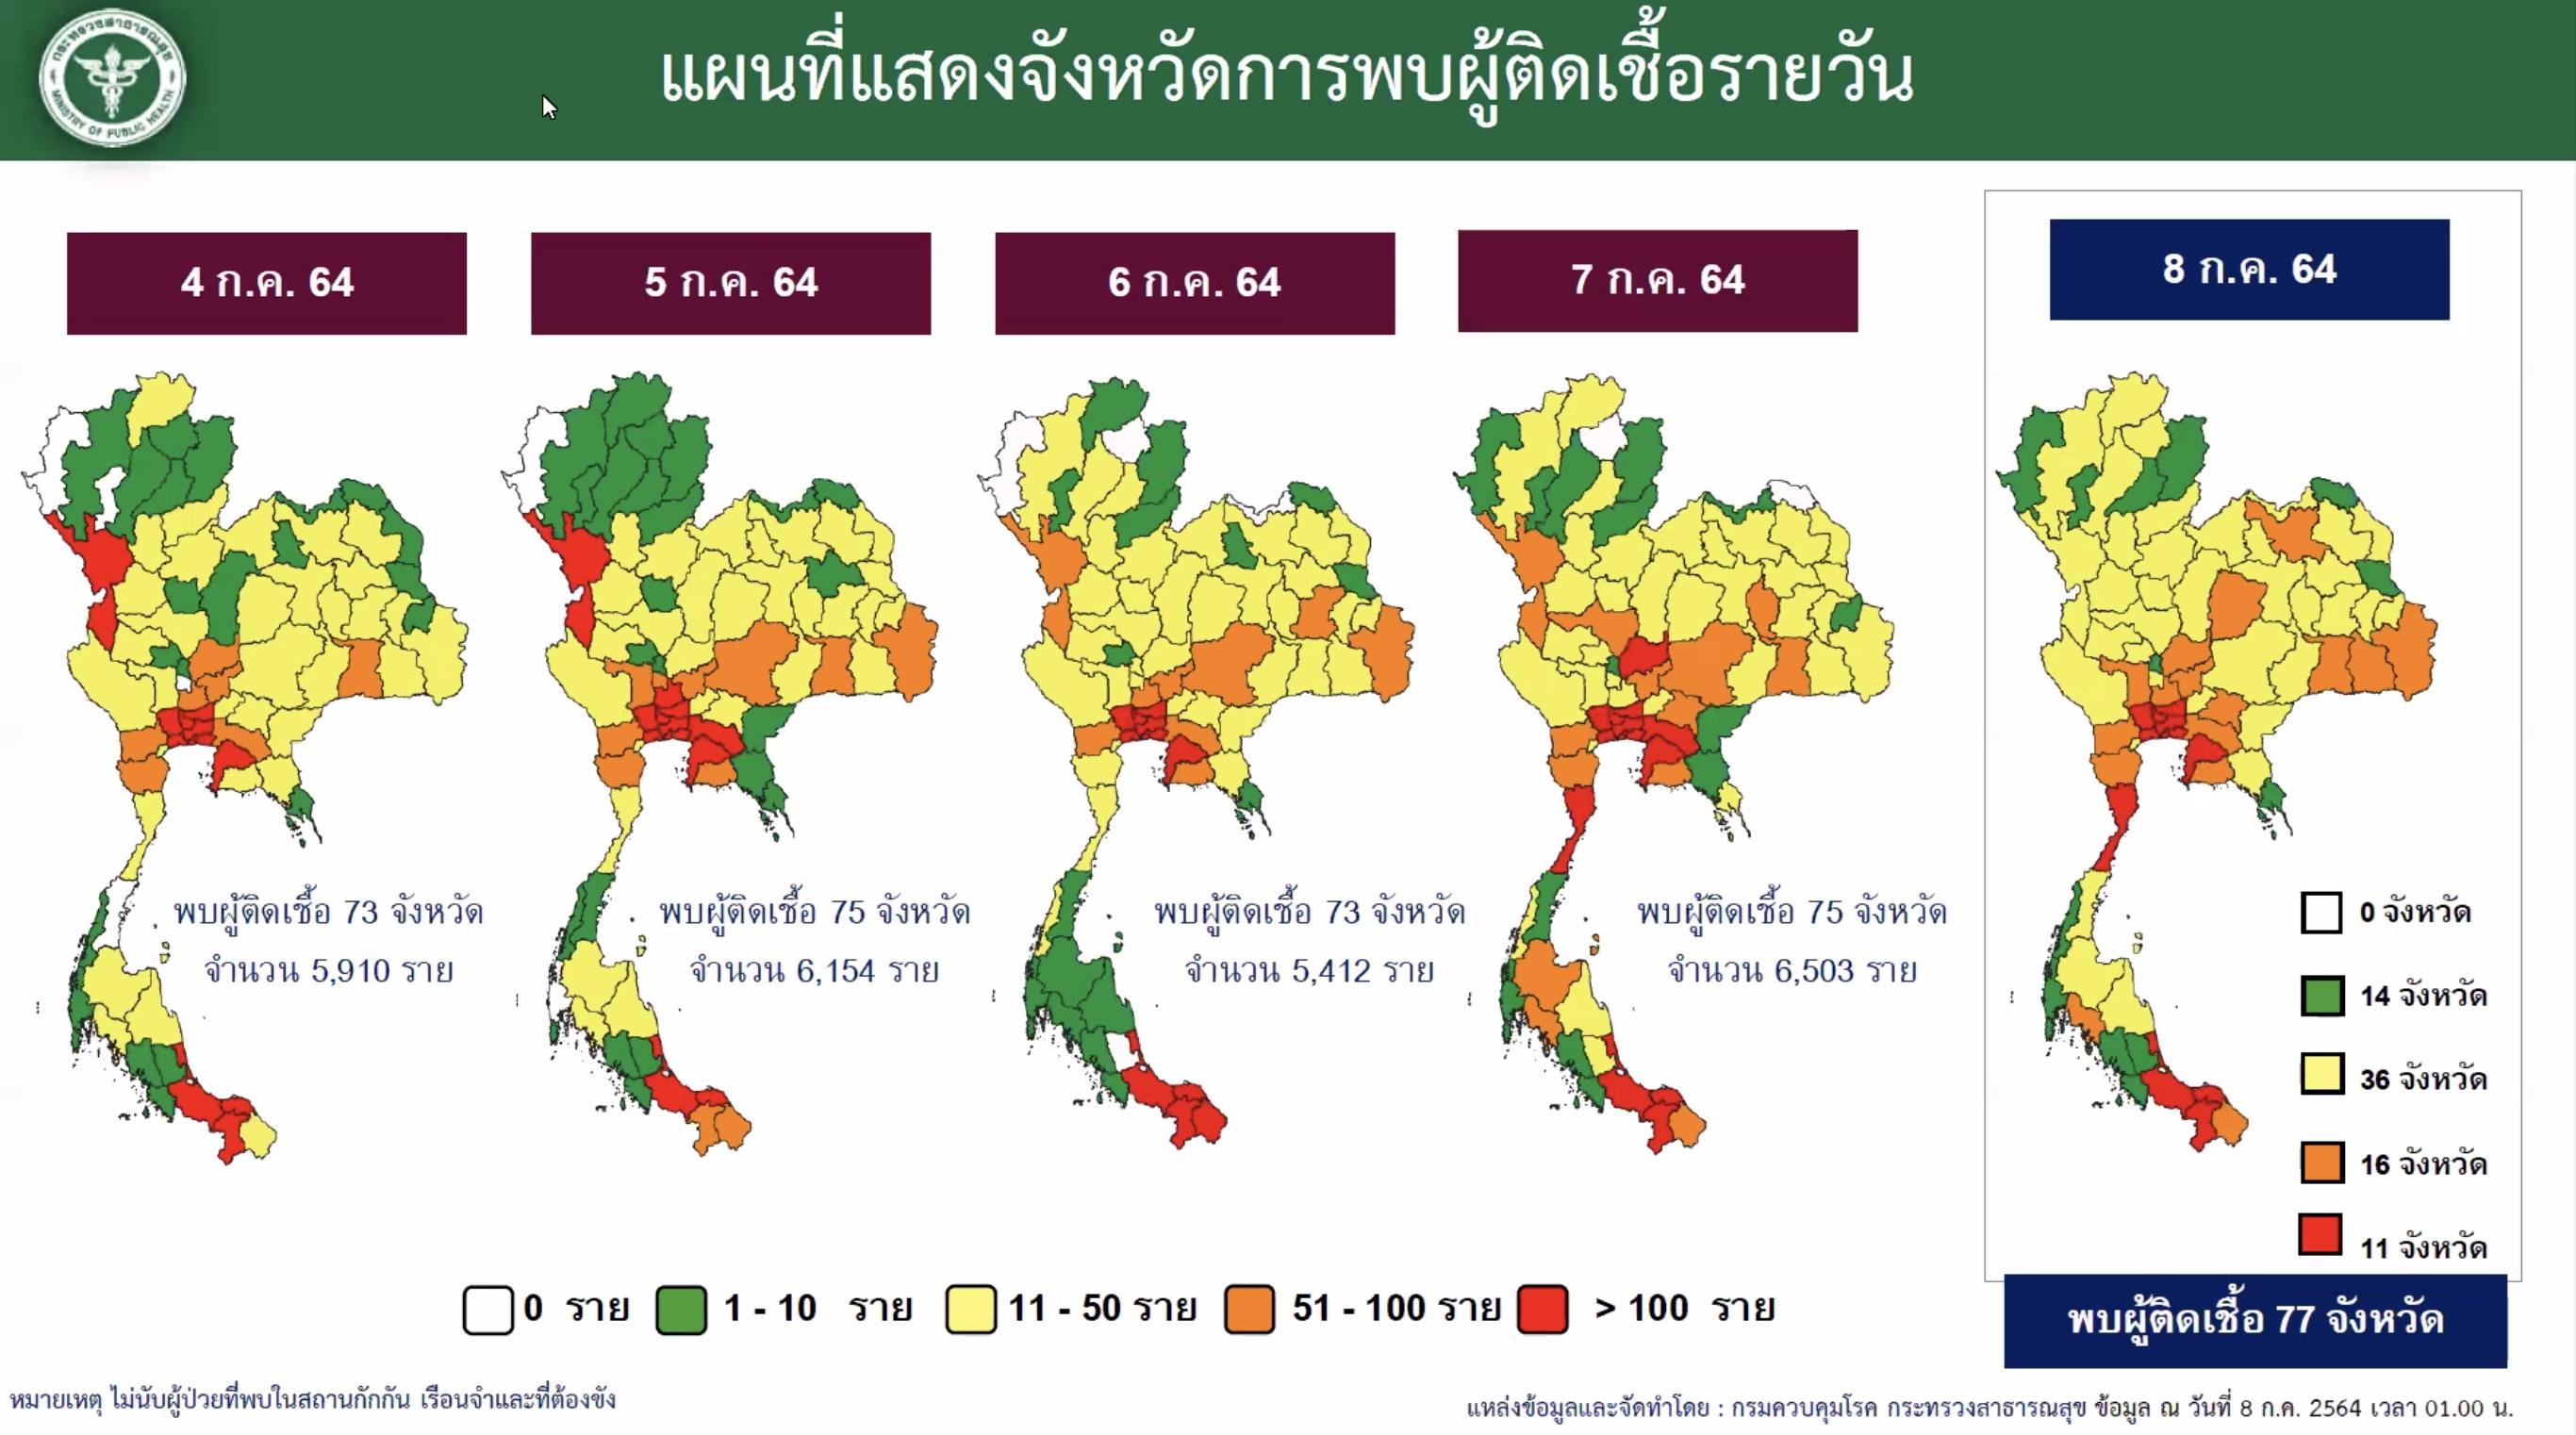 www.thaiguide.dk/images/forum/covid19/smitteudviklingen%20uge%2008-07-21.jpg